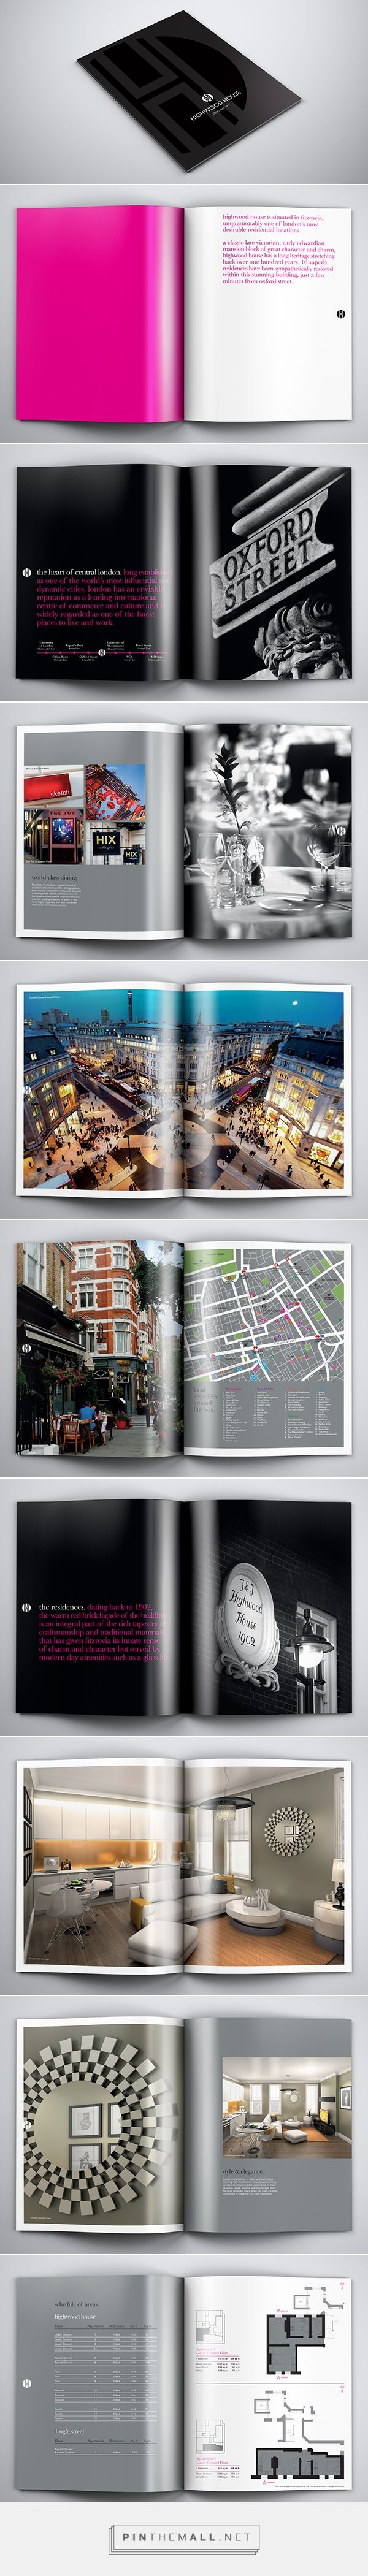 85 best real estate images on pinterest property branding brand